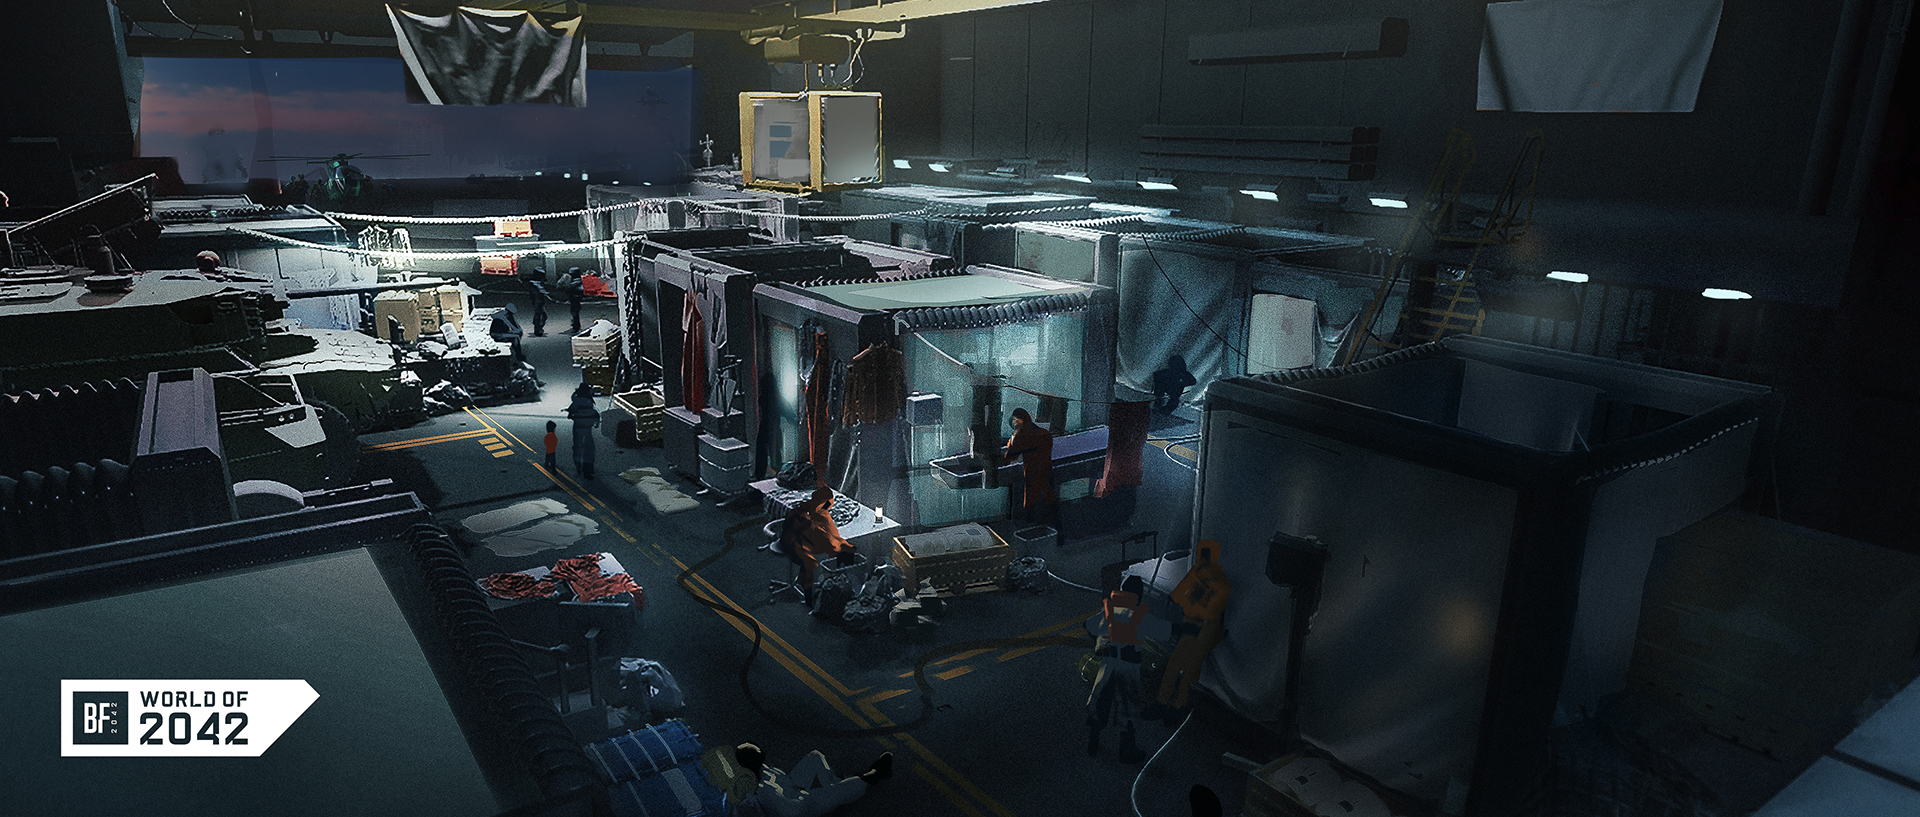 Battlefield Briefing_ The World of 2042 - Dev Corner 2